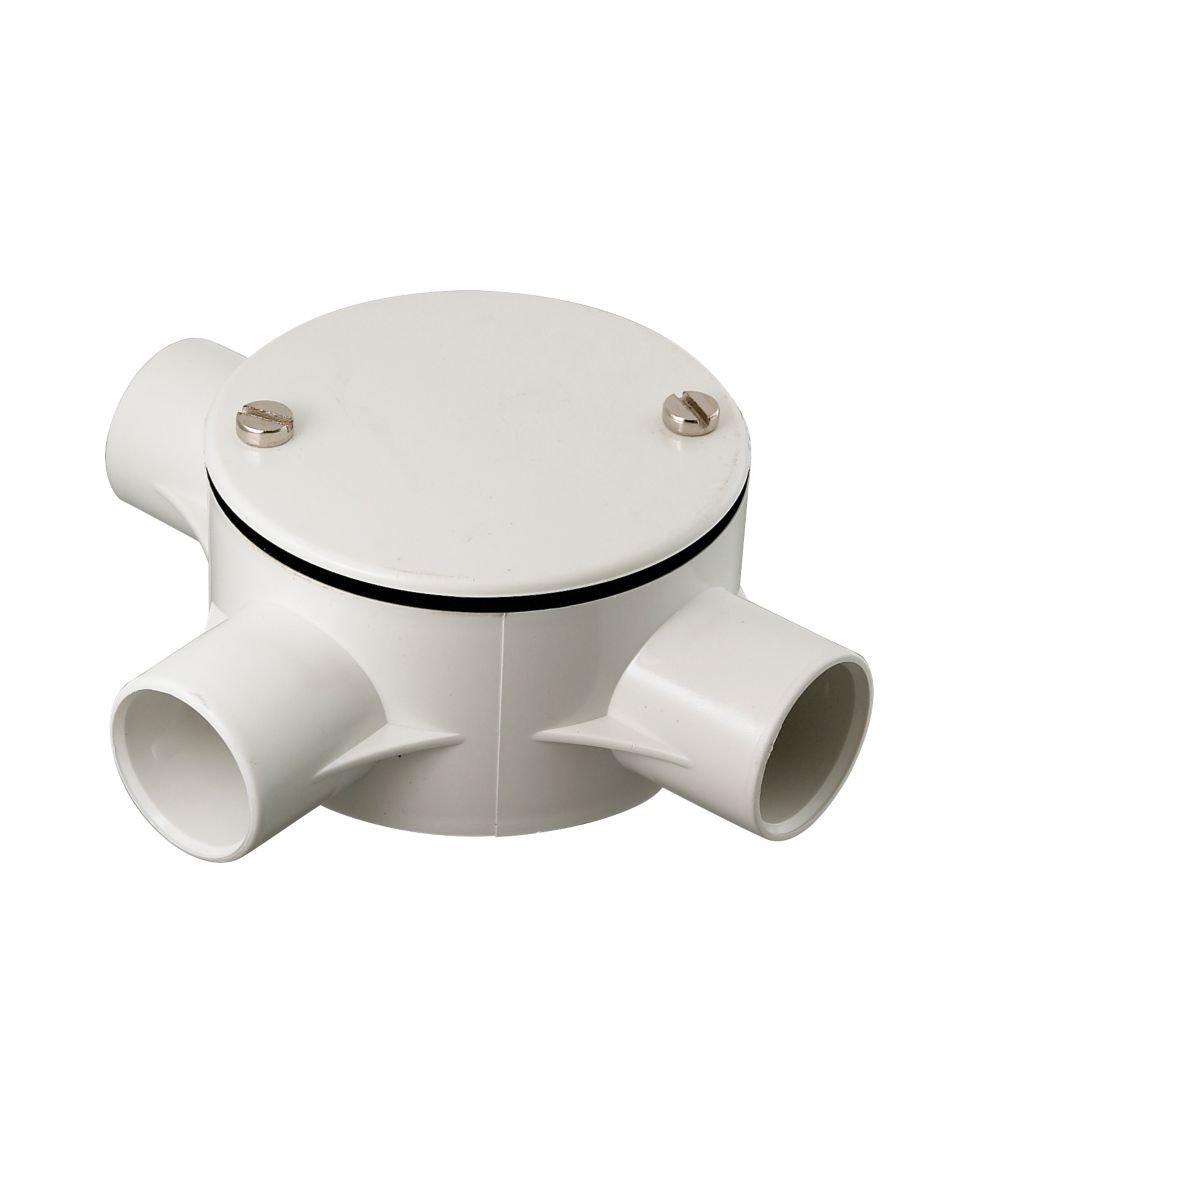 Tower 3-Way Tee Box 20mm White Pack of 1